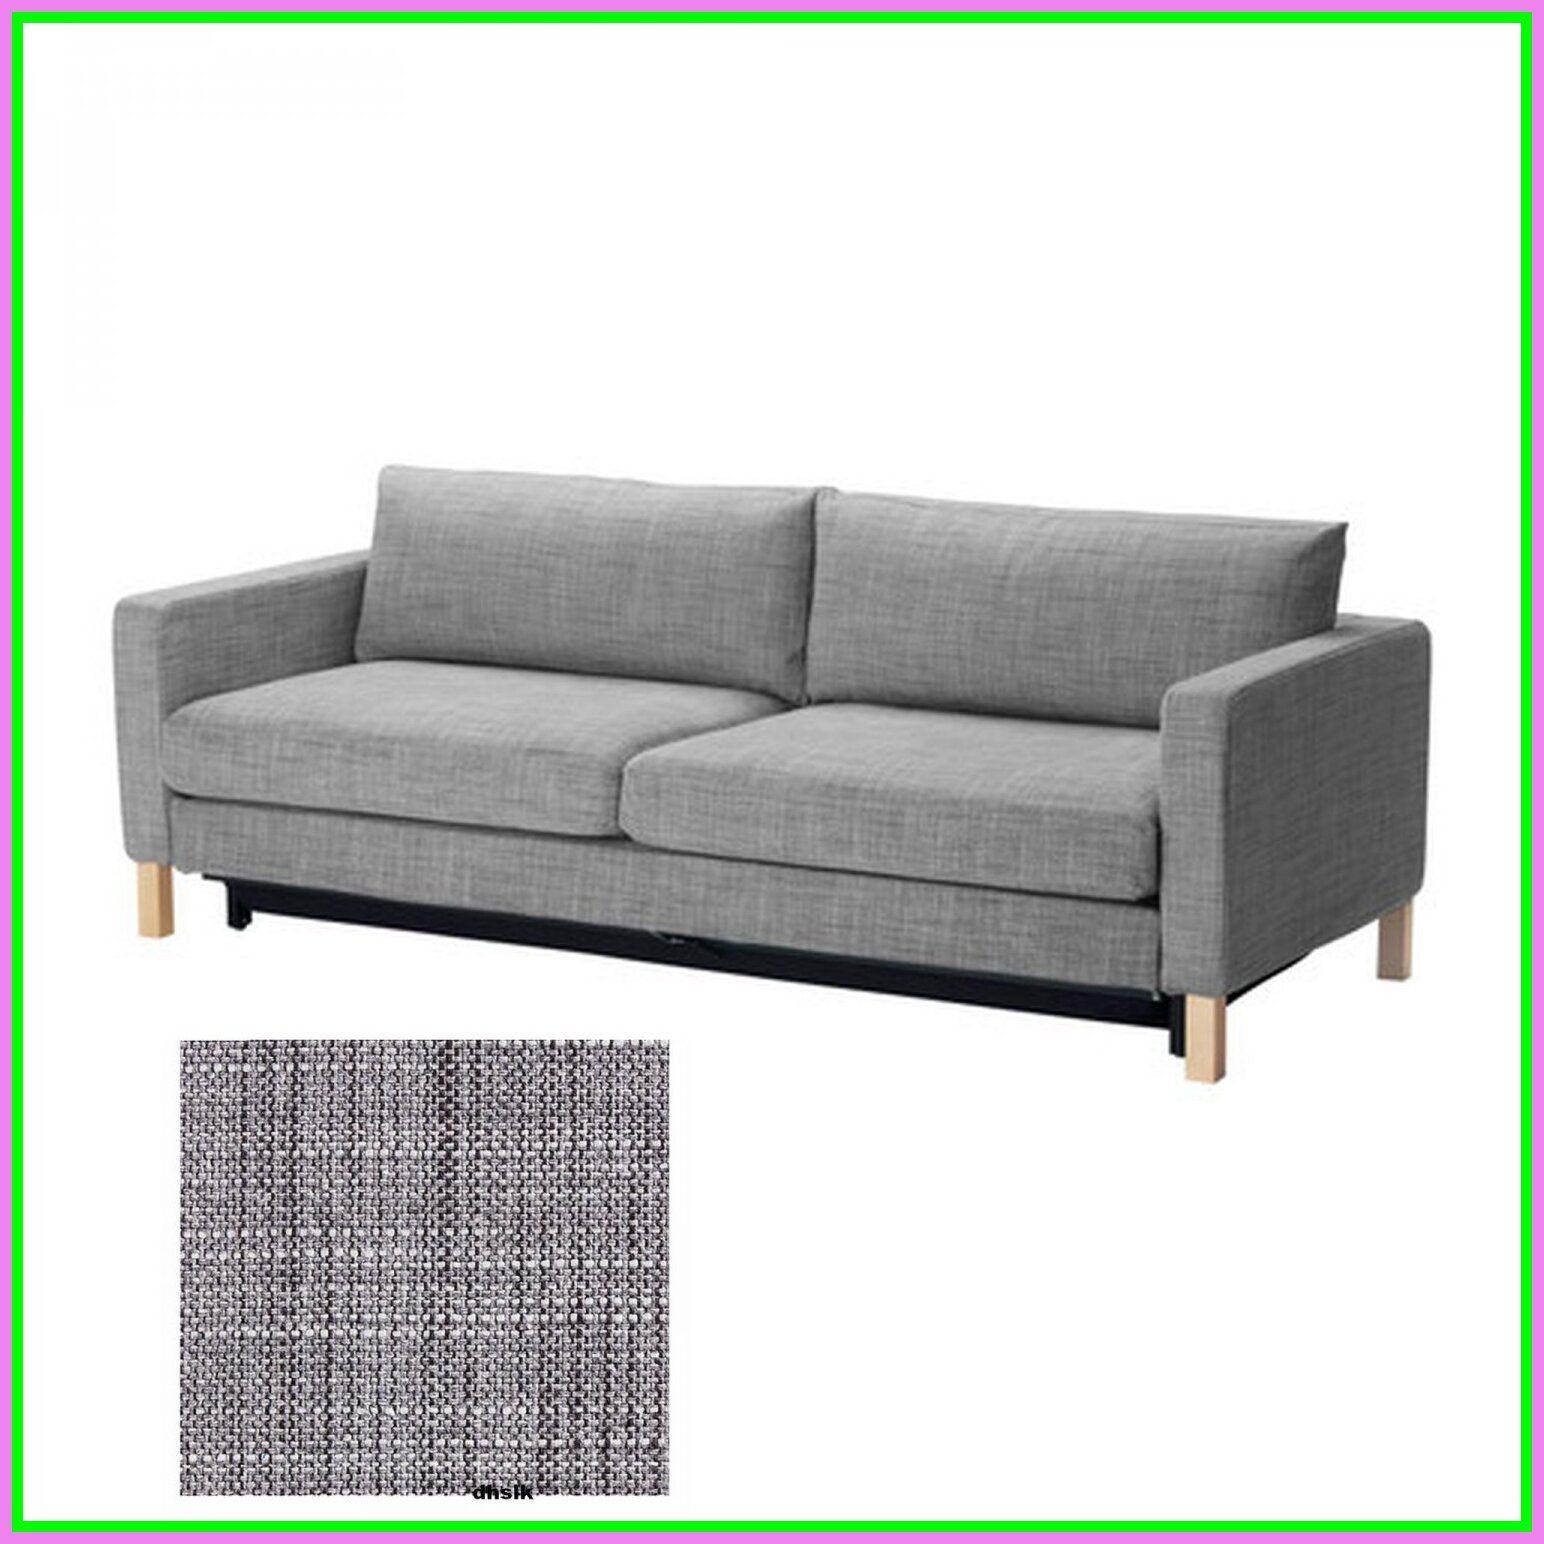 84 Reference Of Karlstad Sofa Cover Dark Gray In 2020 Karlstad Sofa 3 Seater Sofa Bed Sofa